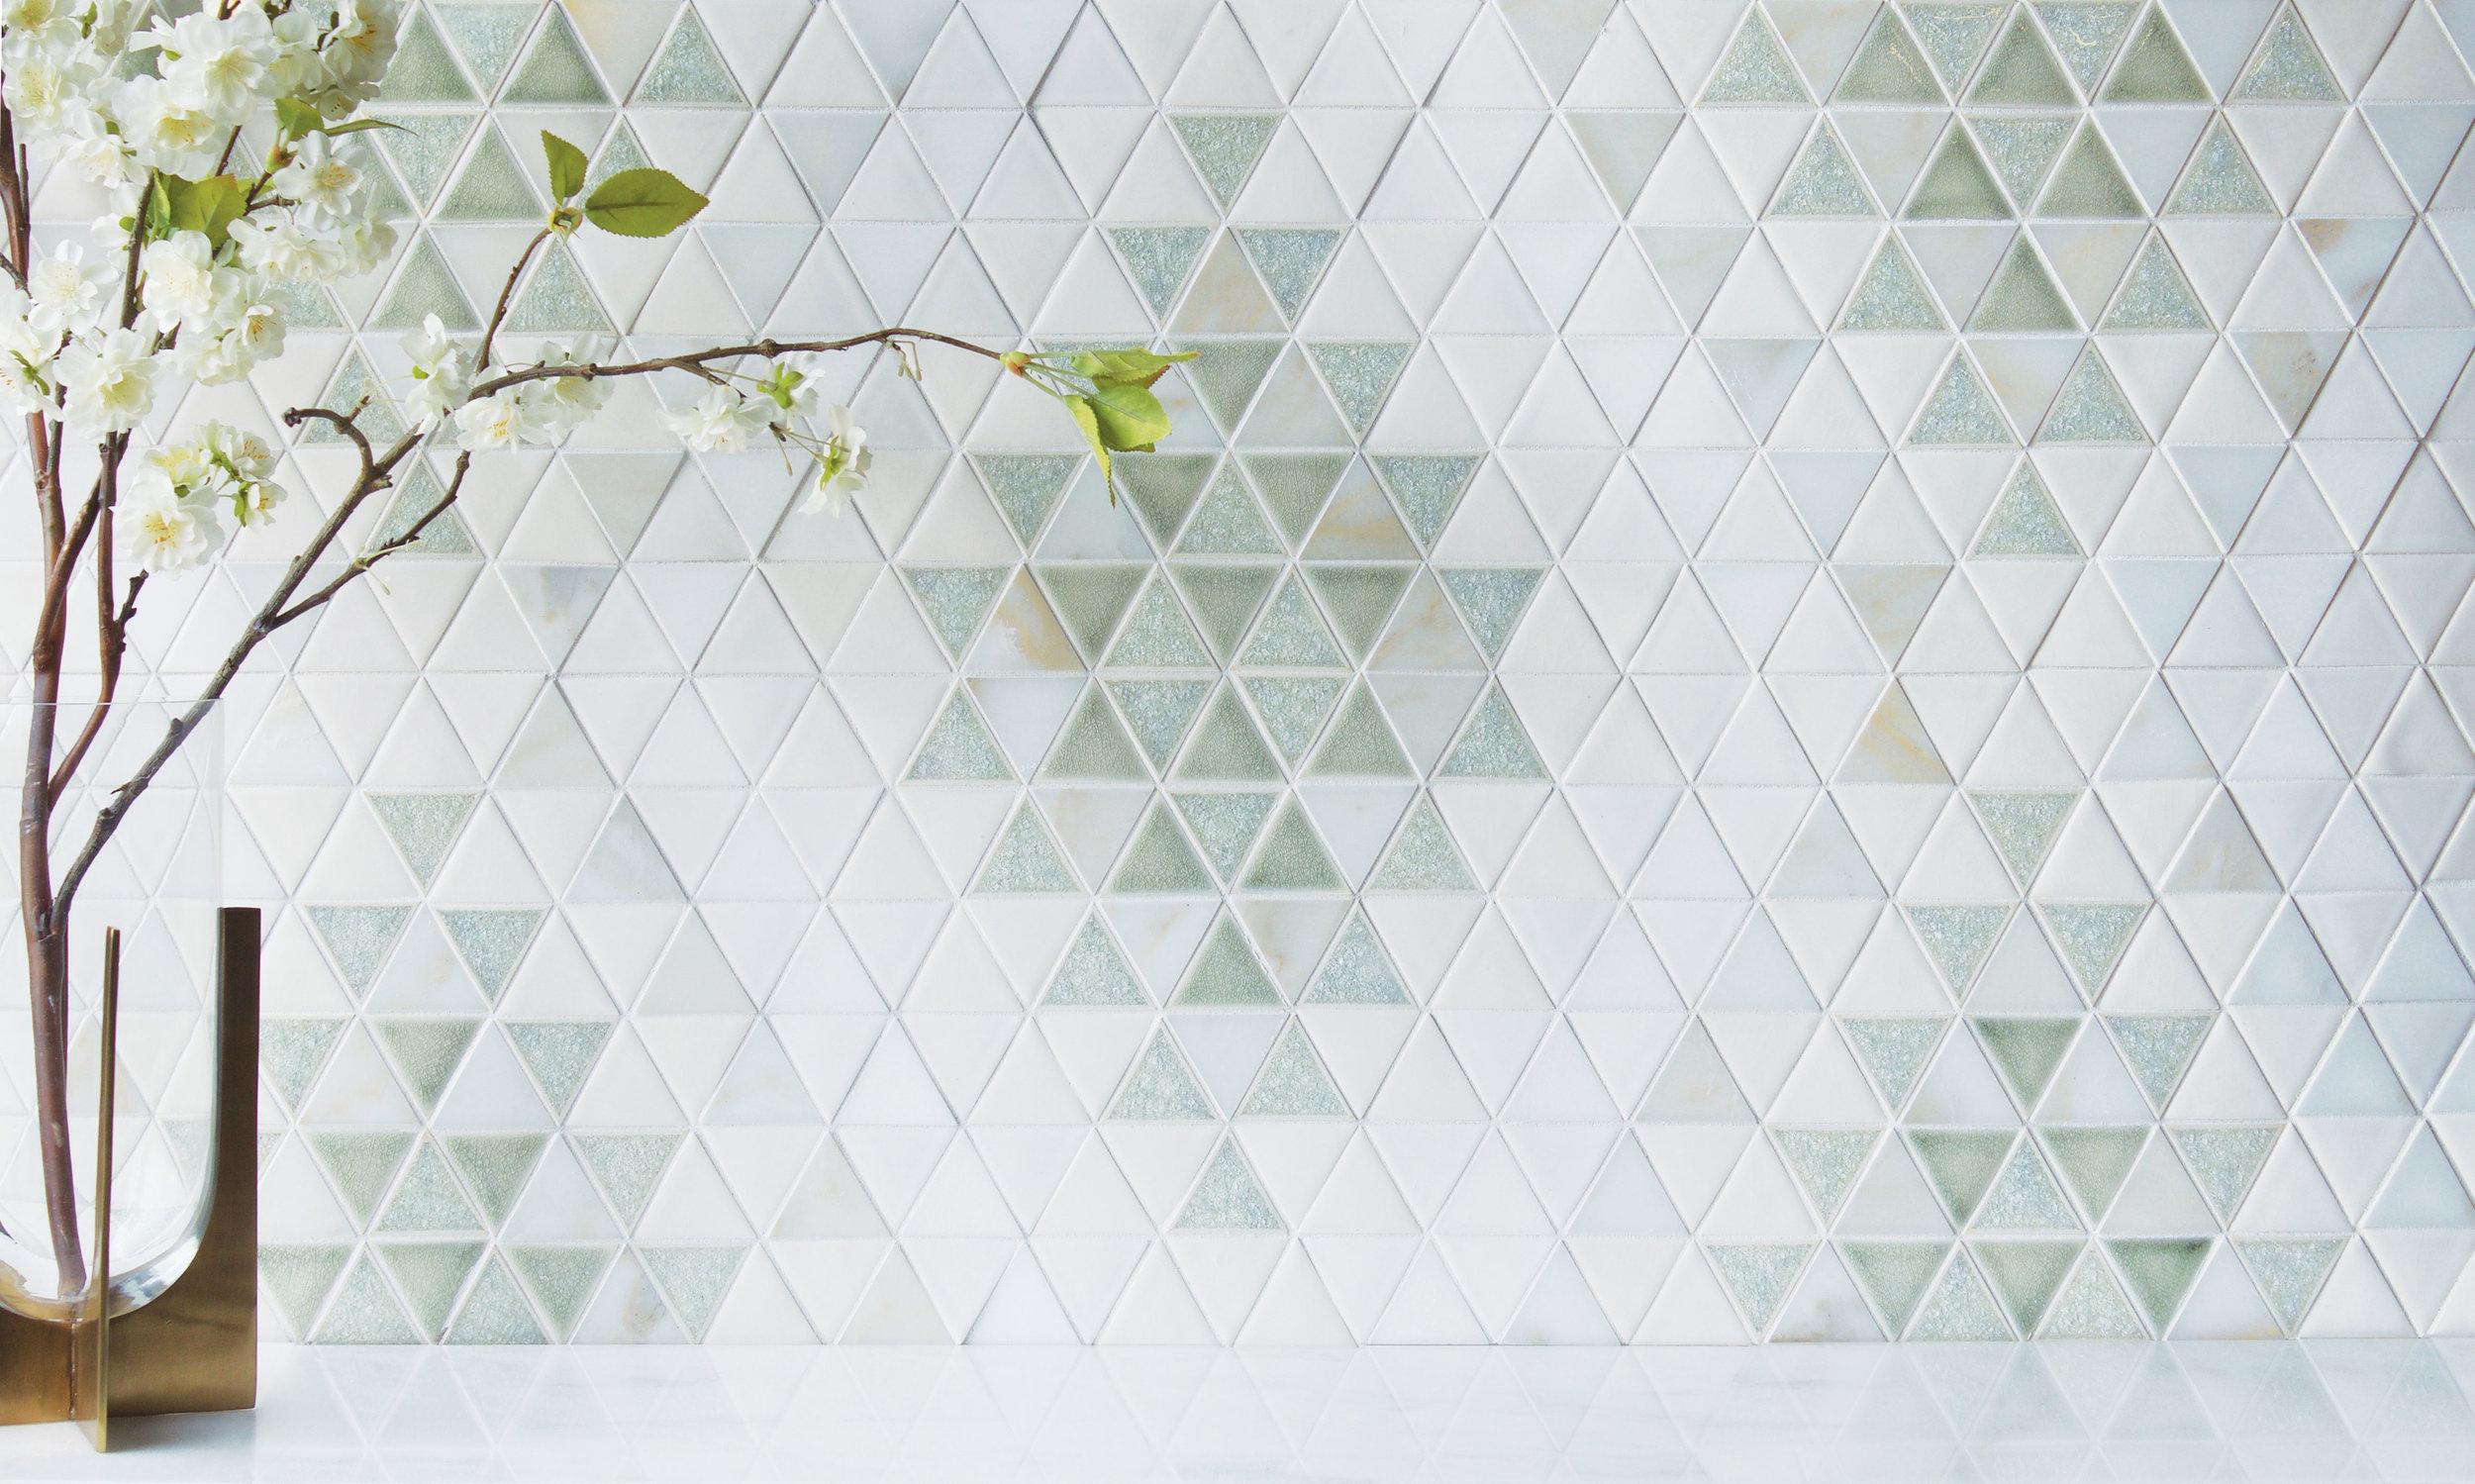 EN - Encore -Triangle Kilim Pattern Rain quartz, Cashmere crackle, Alabaster sheer, Milk gloss, Calacatta, Thassos - Mosaic - Backsplashes.jpg